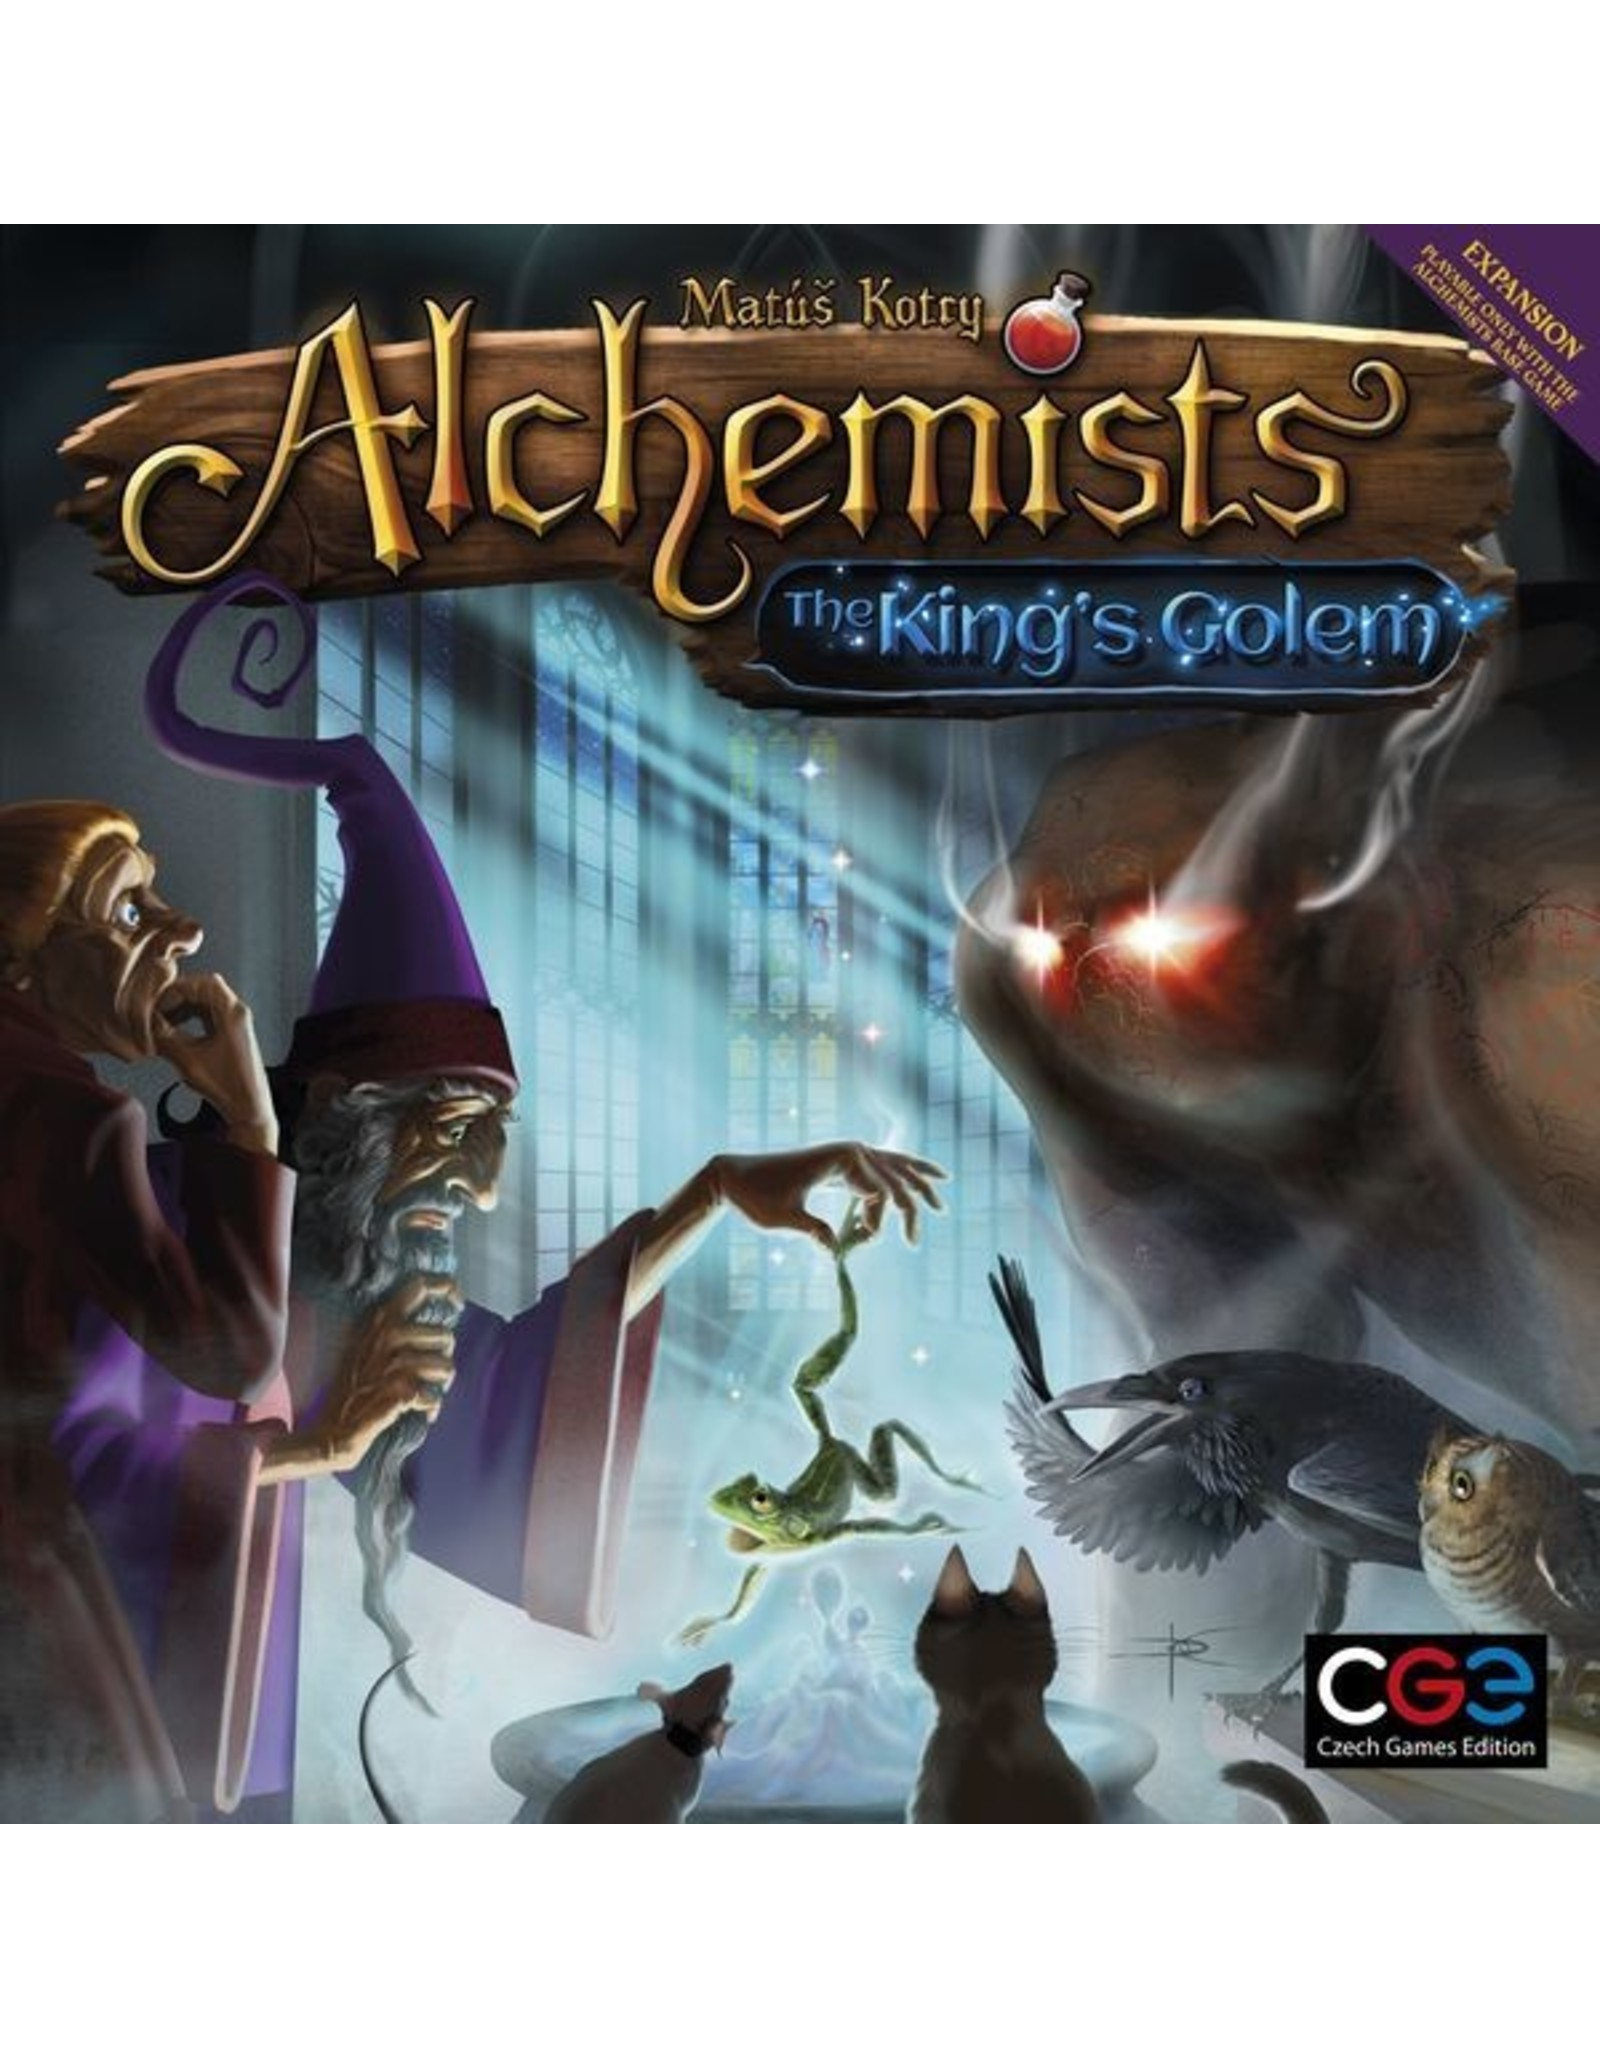 Czech Games Edition ALCHEMISTS: THE KINGS GOLEM